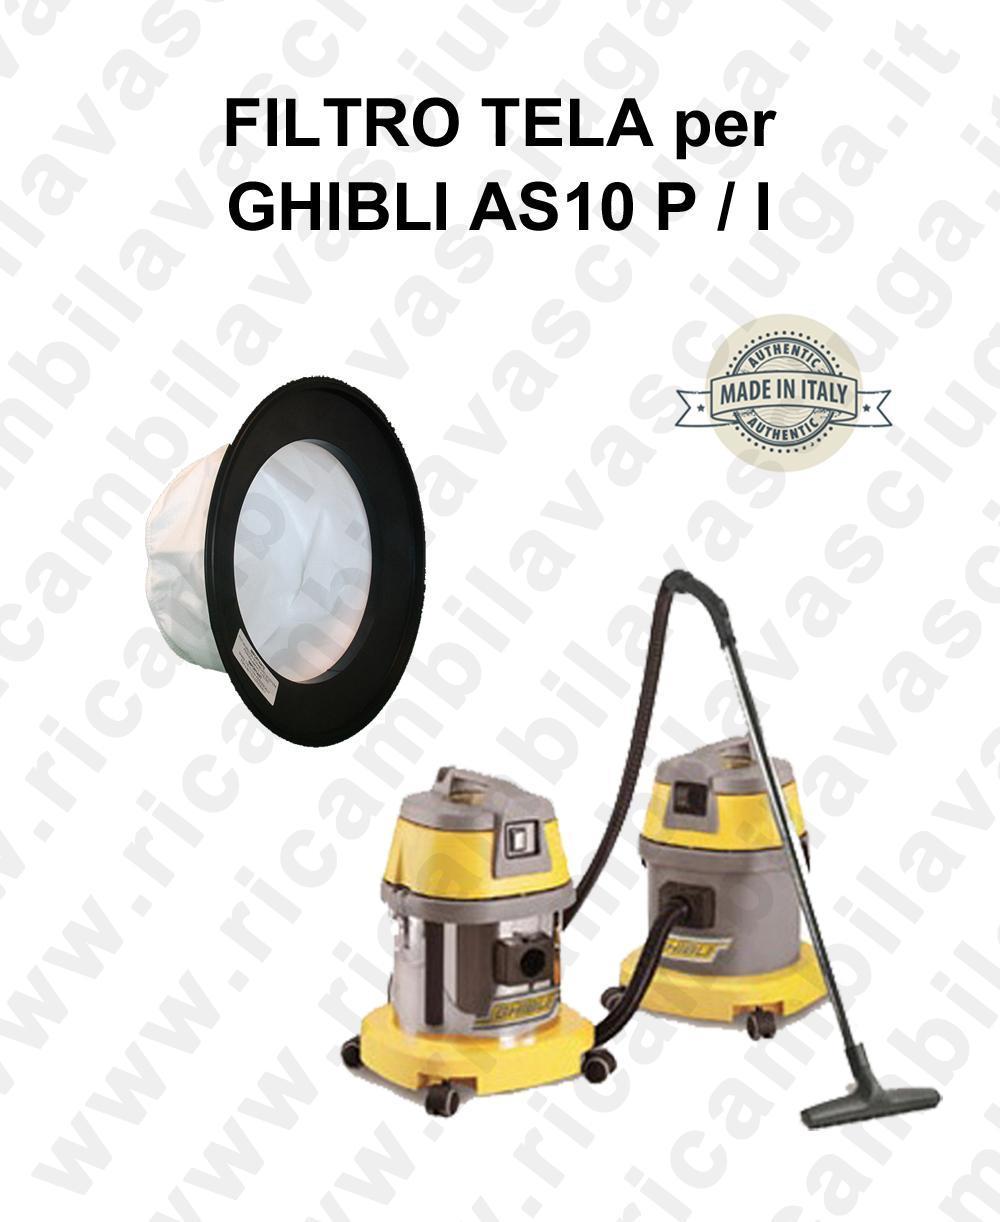 Filtro de tela para aspiradora GHIBLI Model AS10 P / I